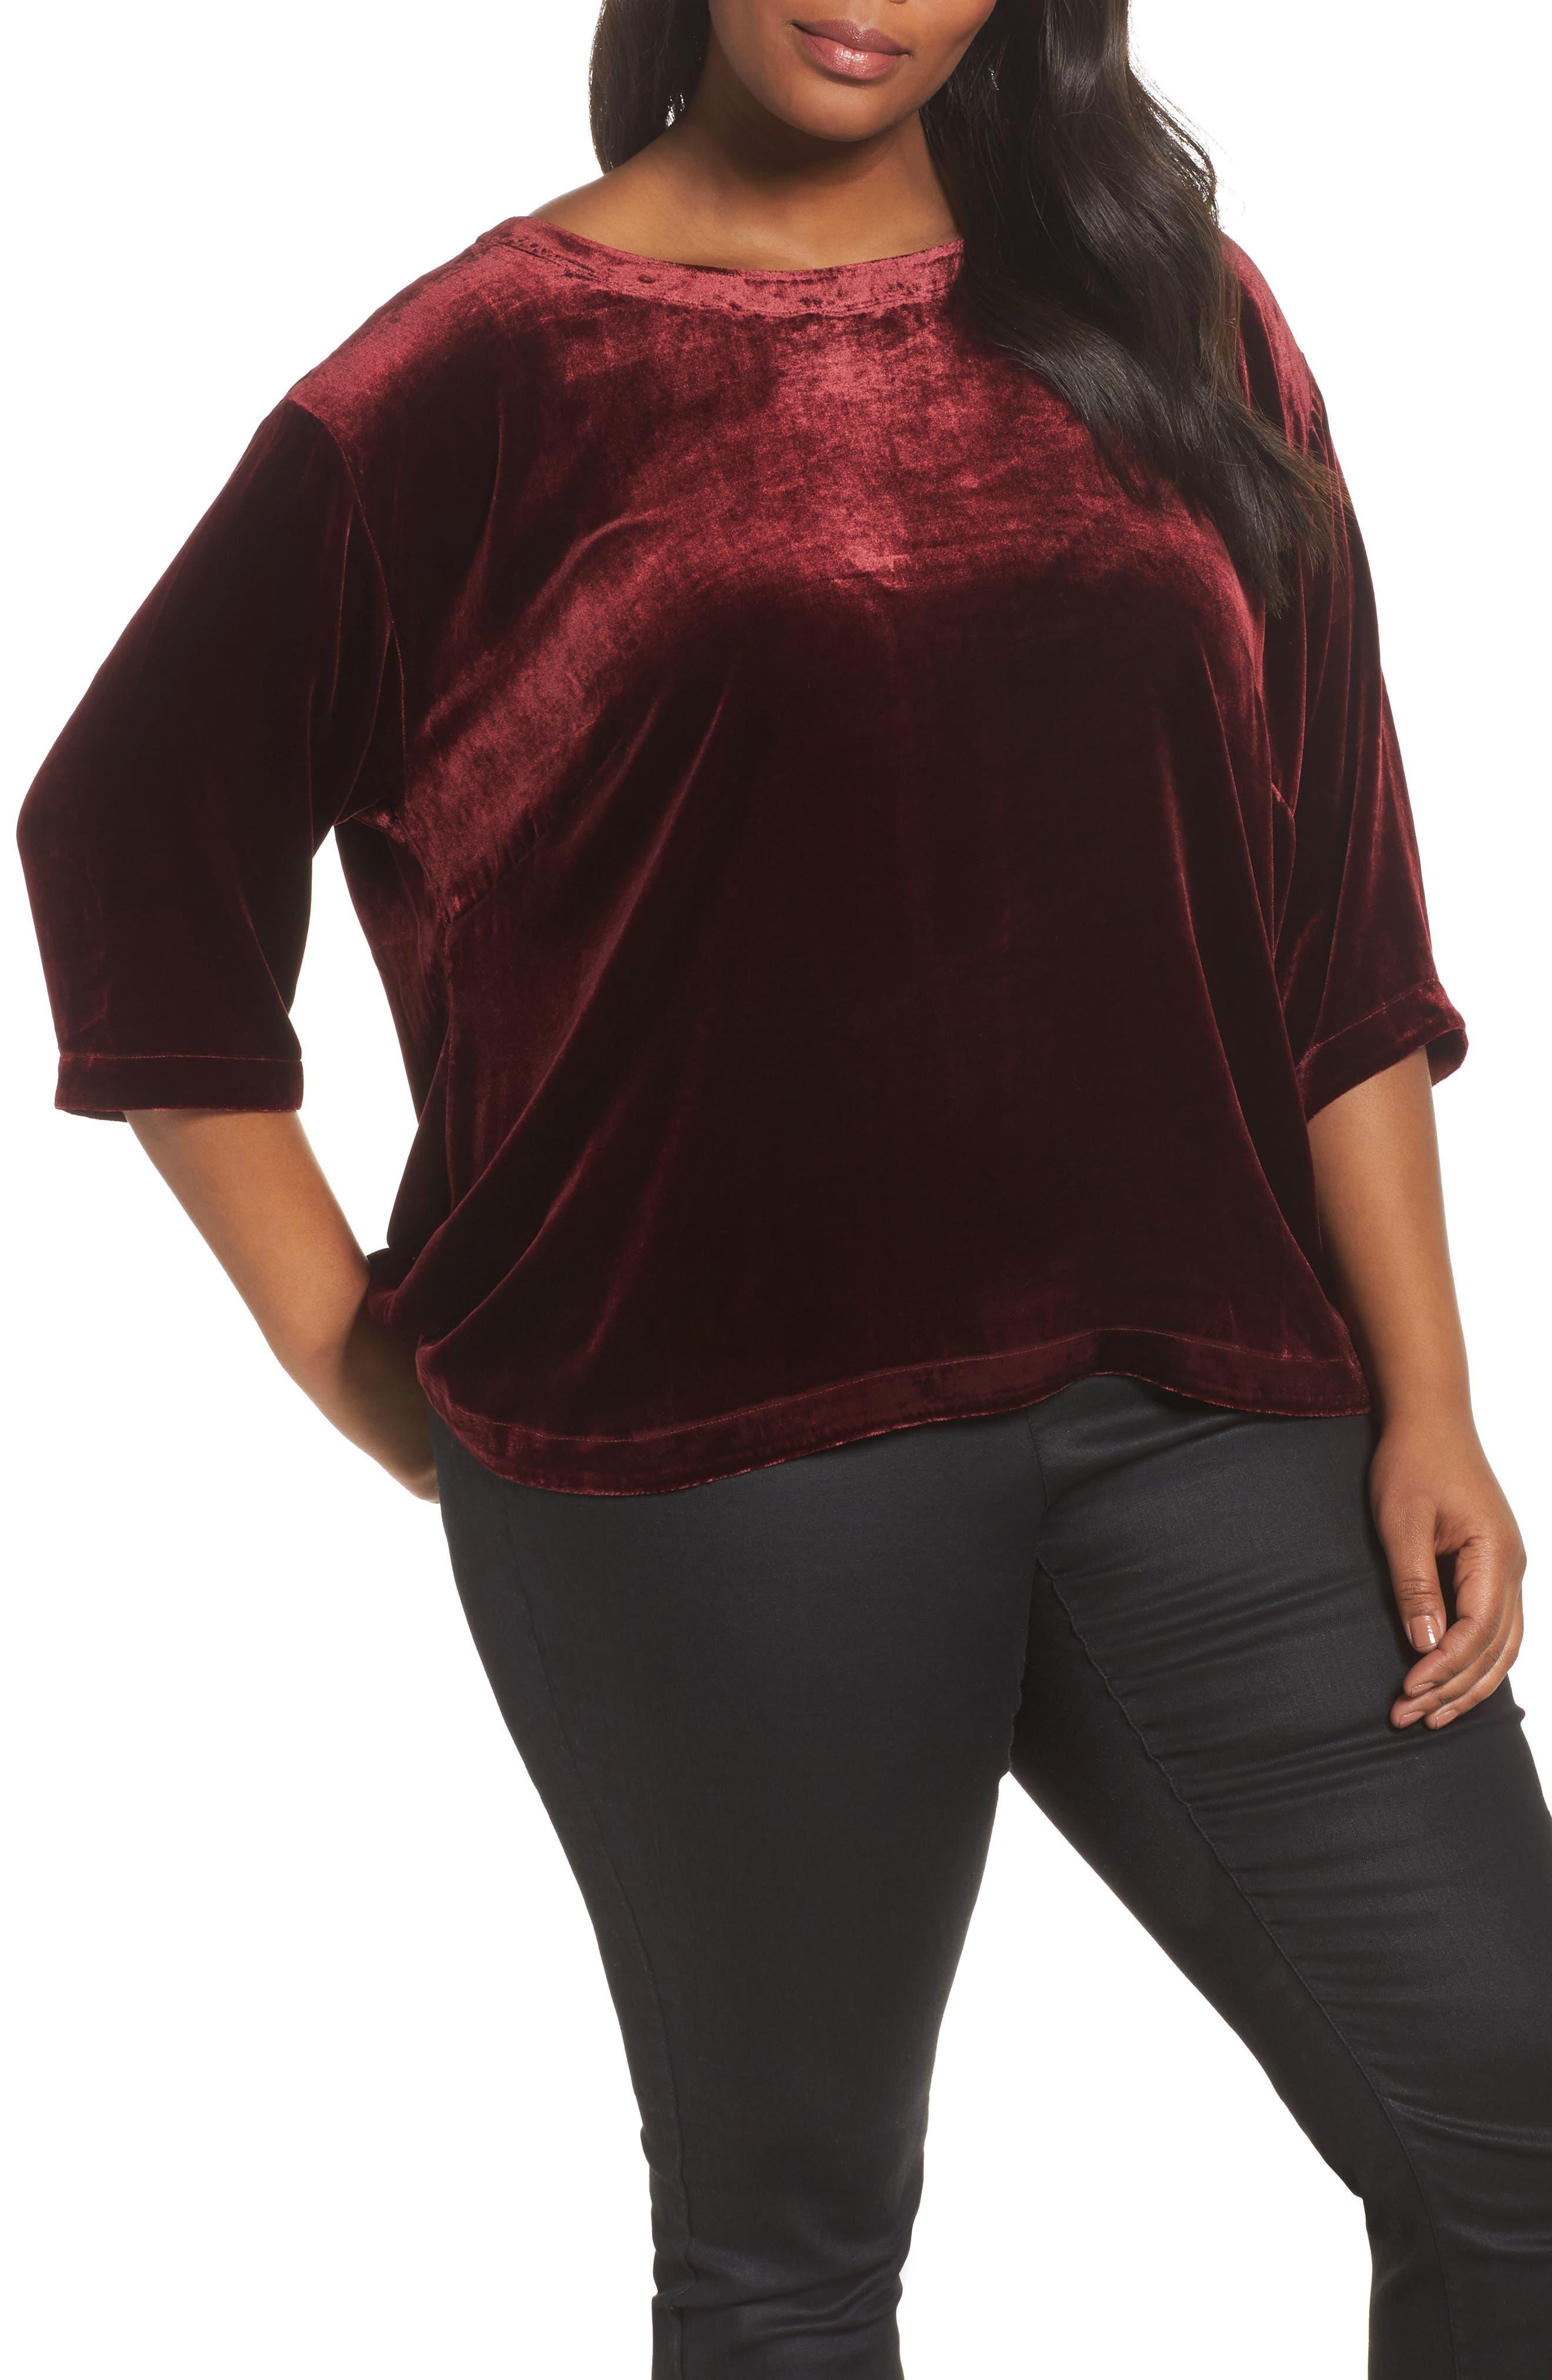 Alternate Image 1 Selected - Eileen Fisher Boxy Velvet Top (Plus Size)